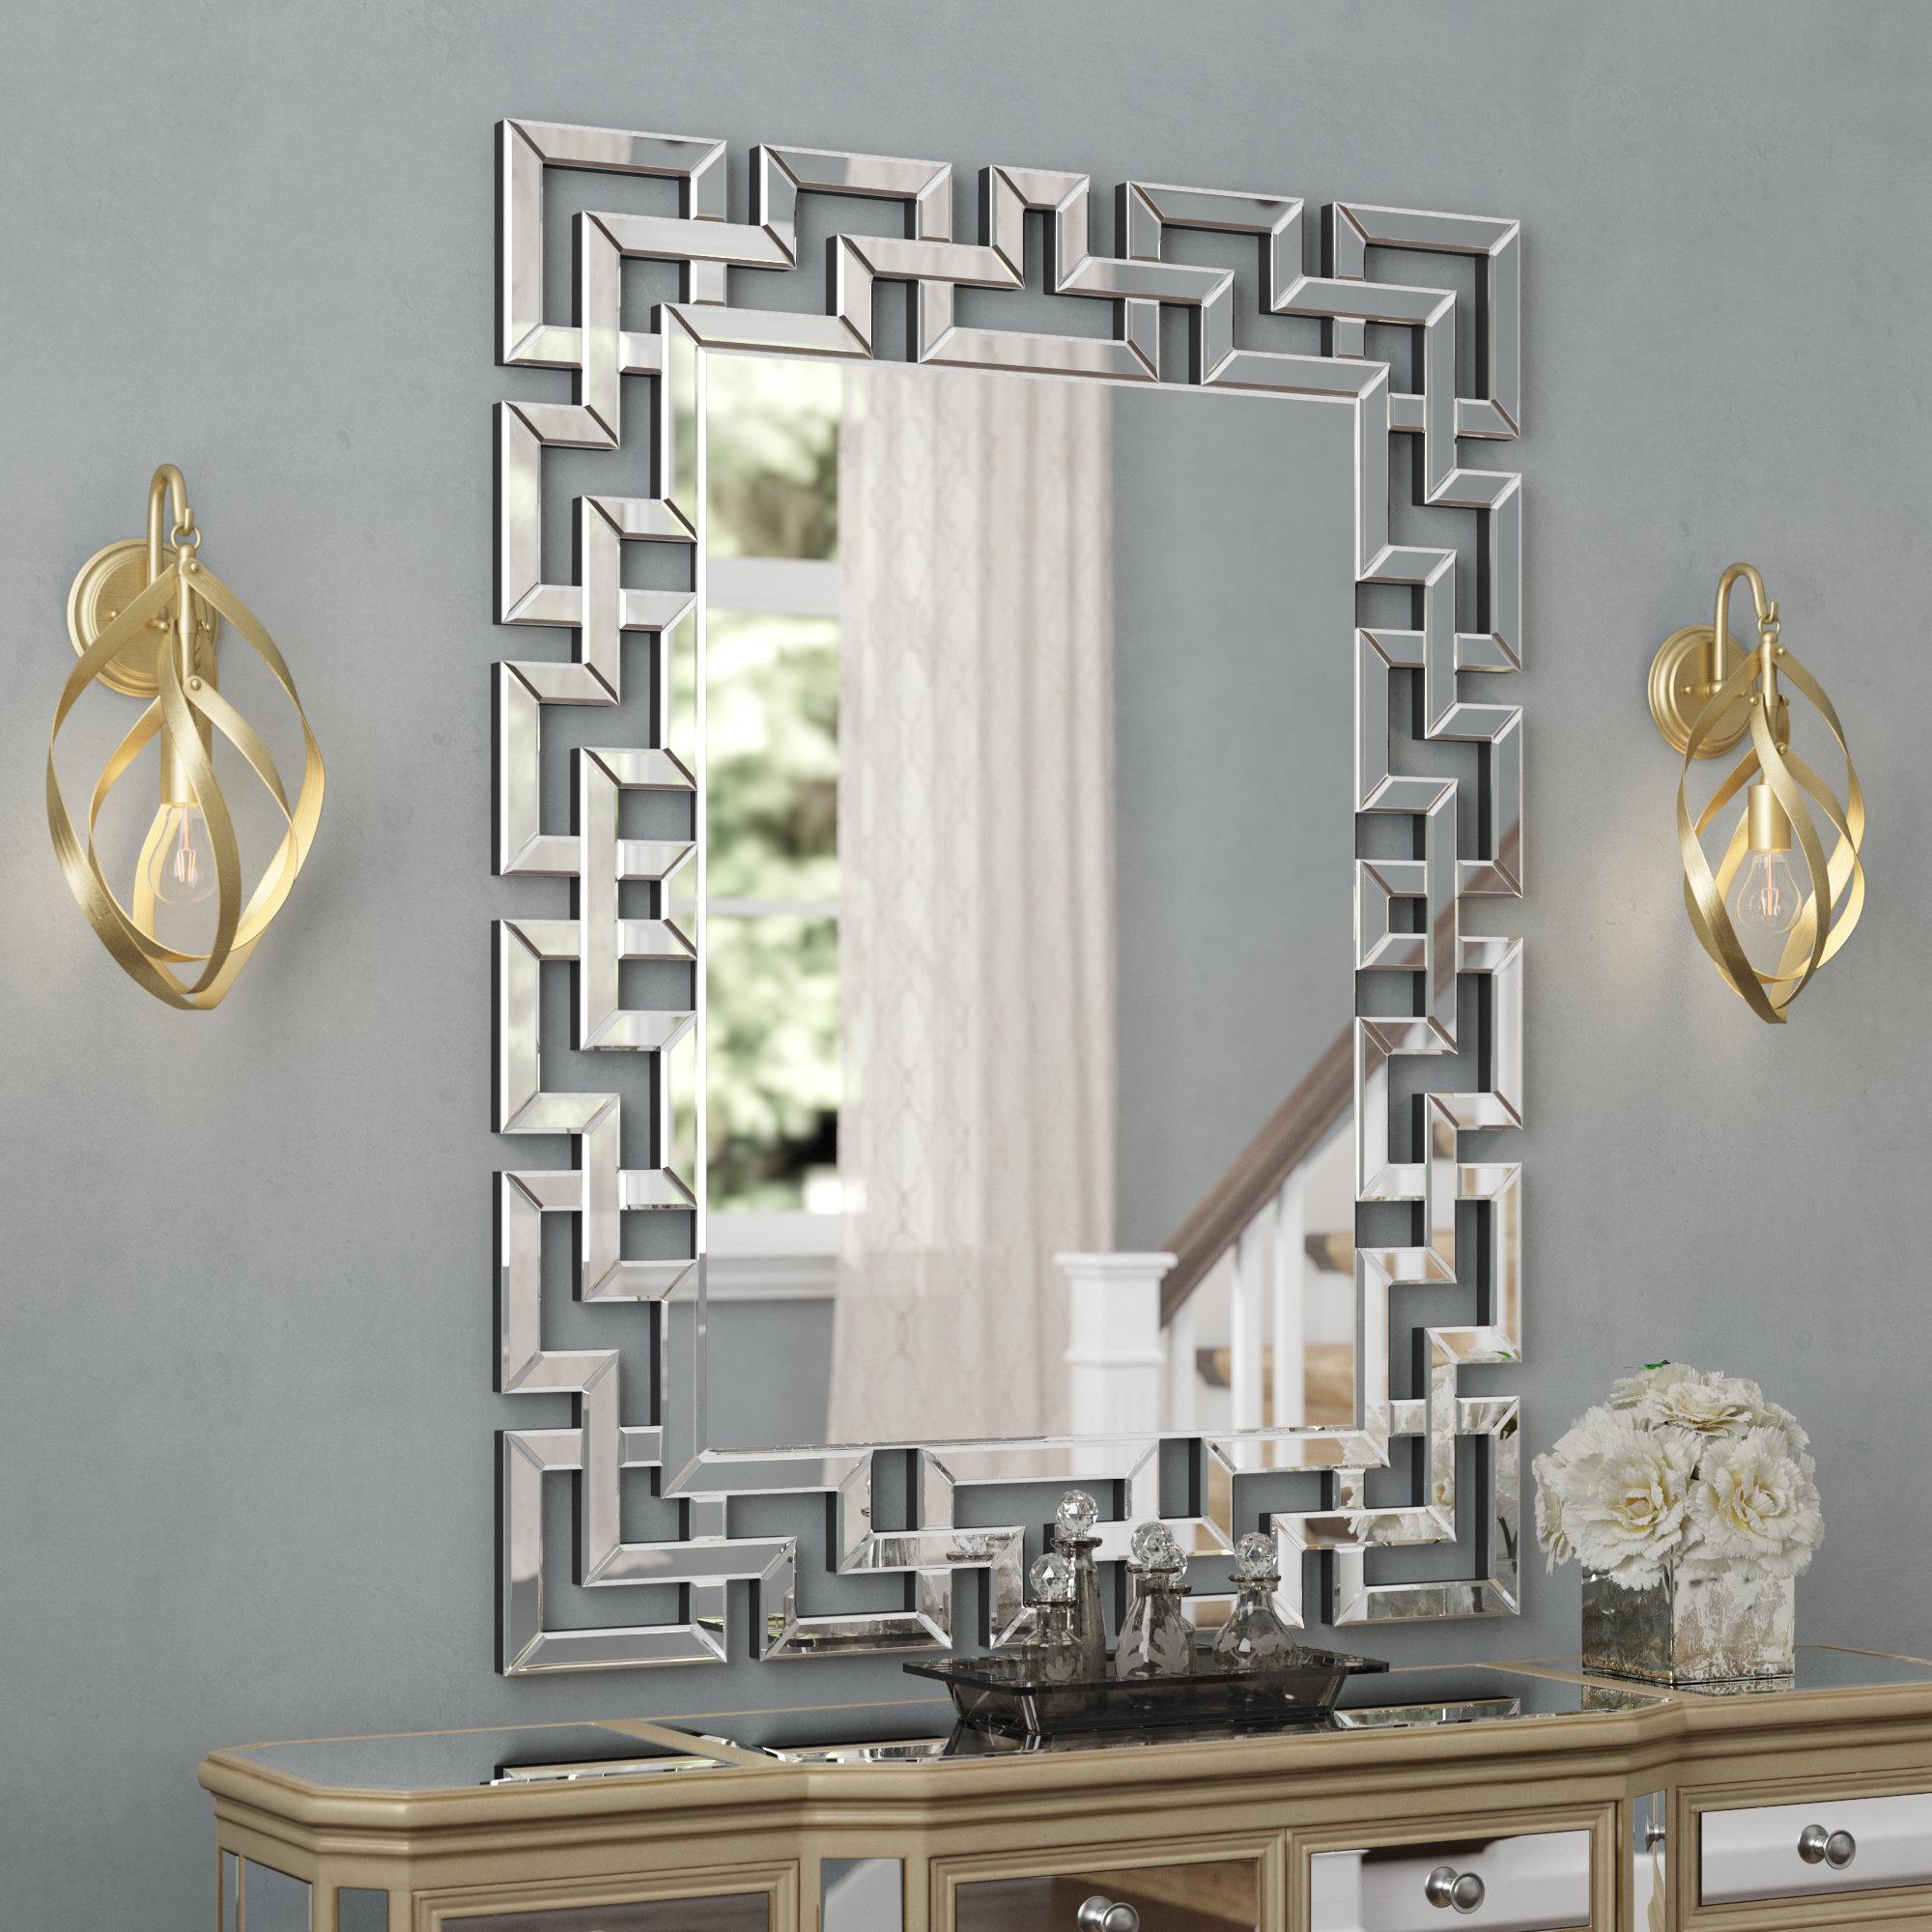 Willa Arlo Interiors Caja Rectangle Glass Frame Wall Mirror in Rectangle Ornate Geometric Wall Mirrors (Image 29 of 30)